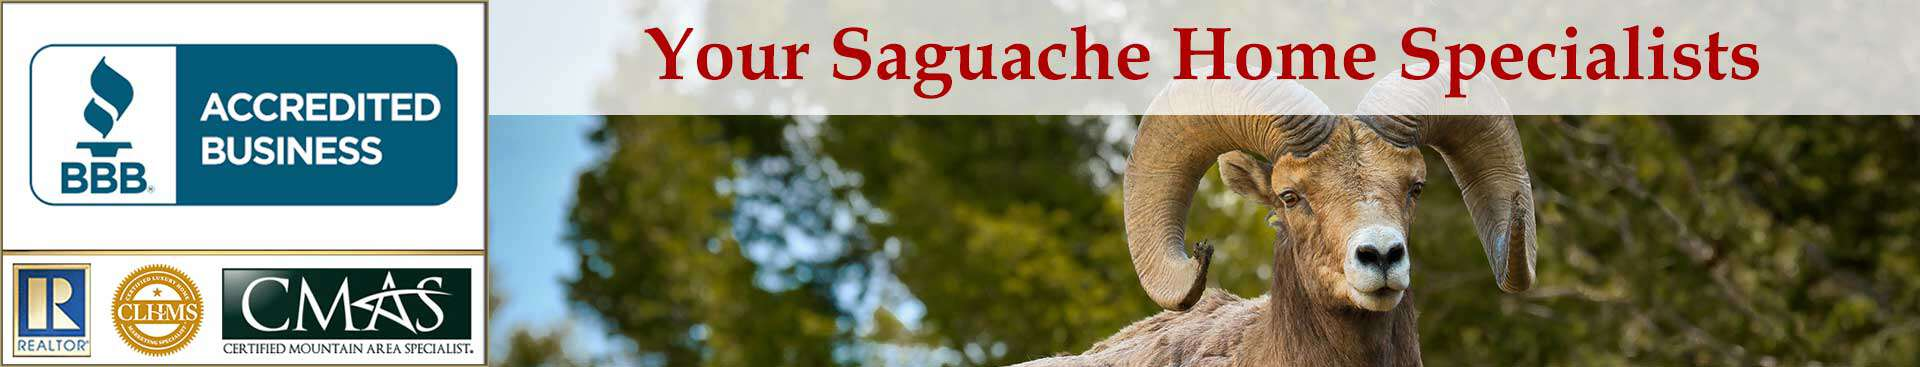 Saguache Accreditations Banner